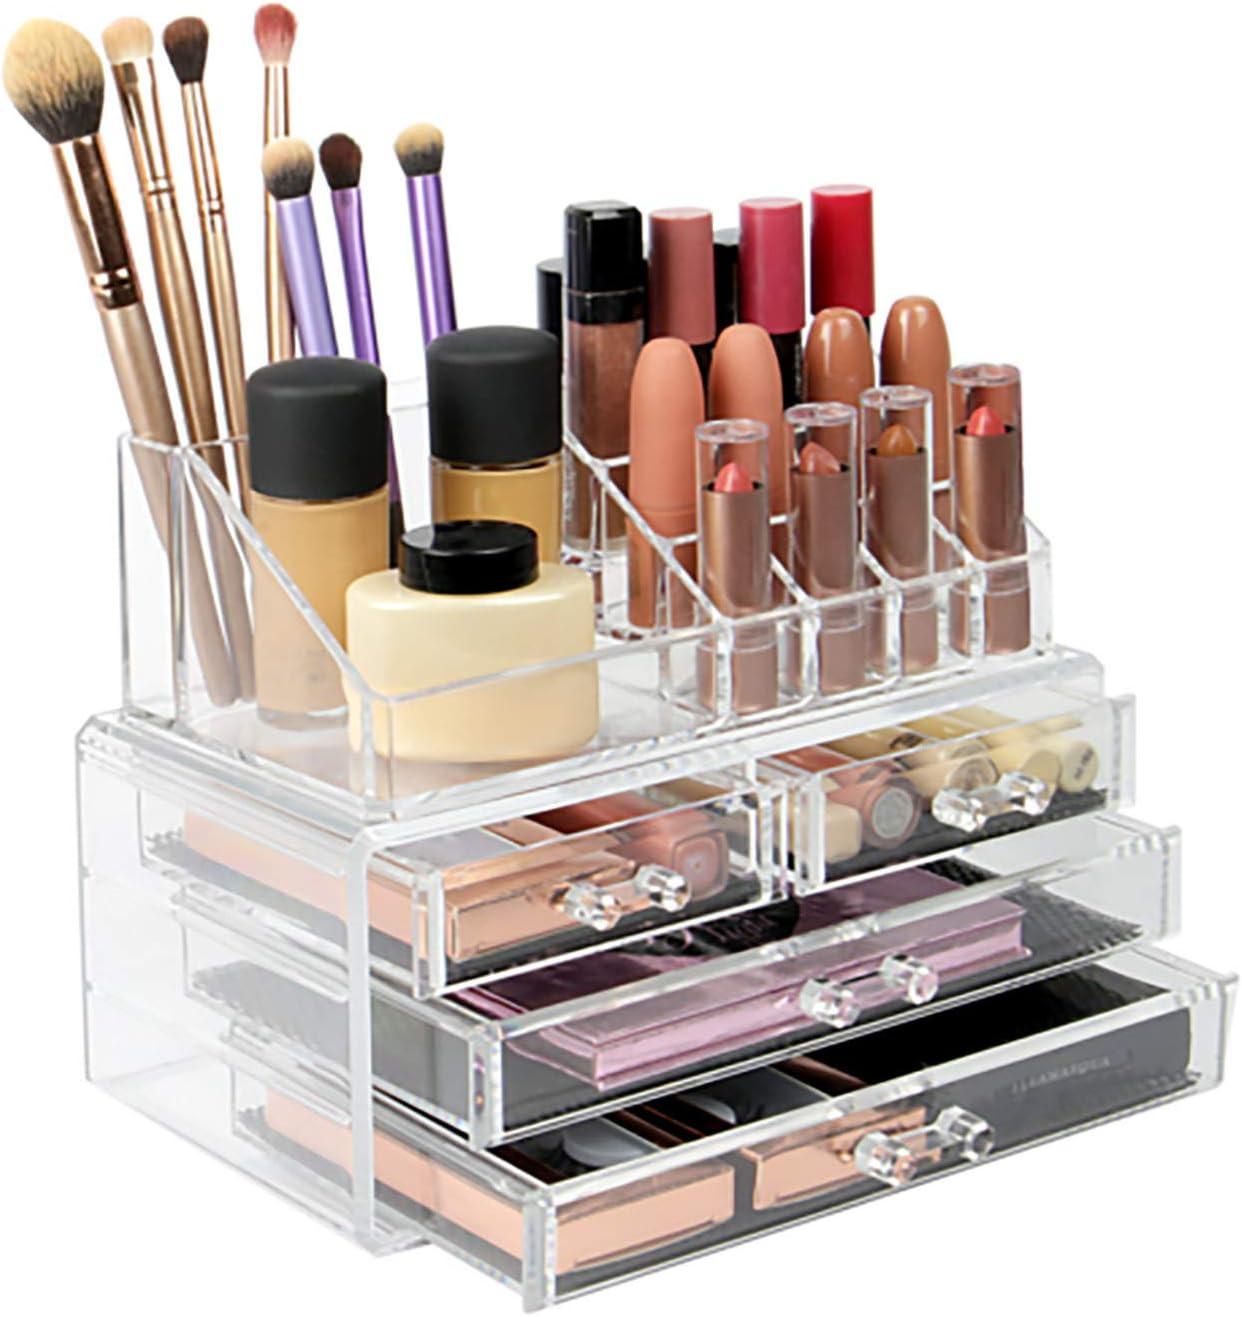 NYW-JJ Clear Acrylic Makeup Beauty Popular popular products Large-Capacity Organizer Sto Desktop